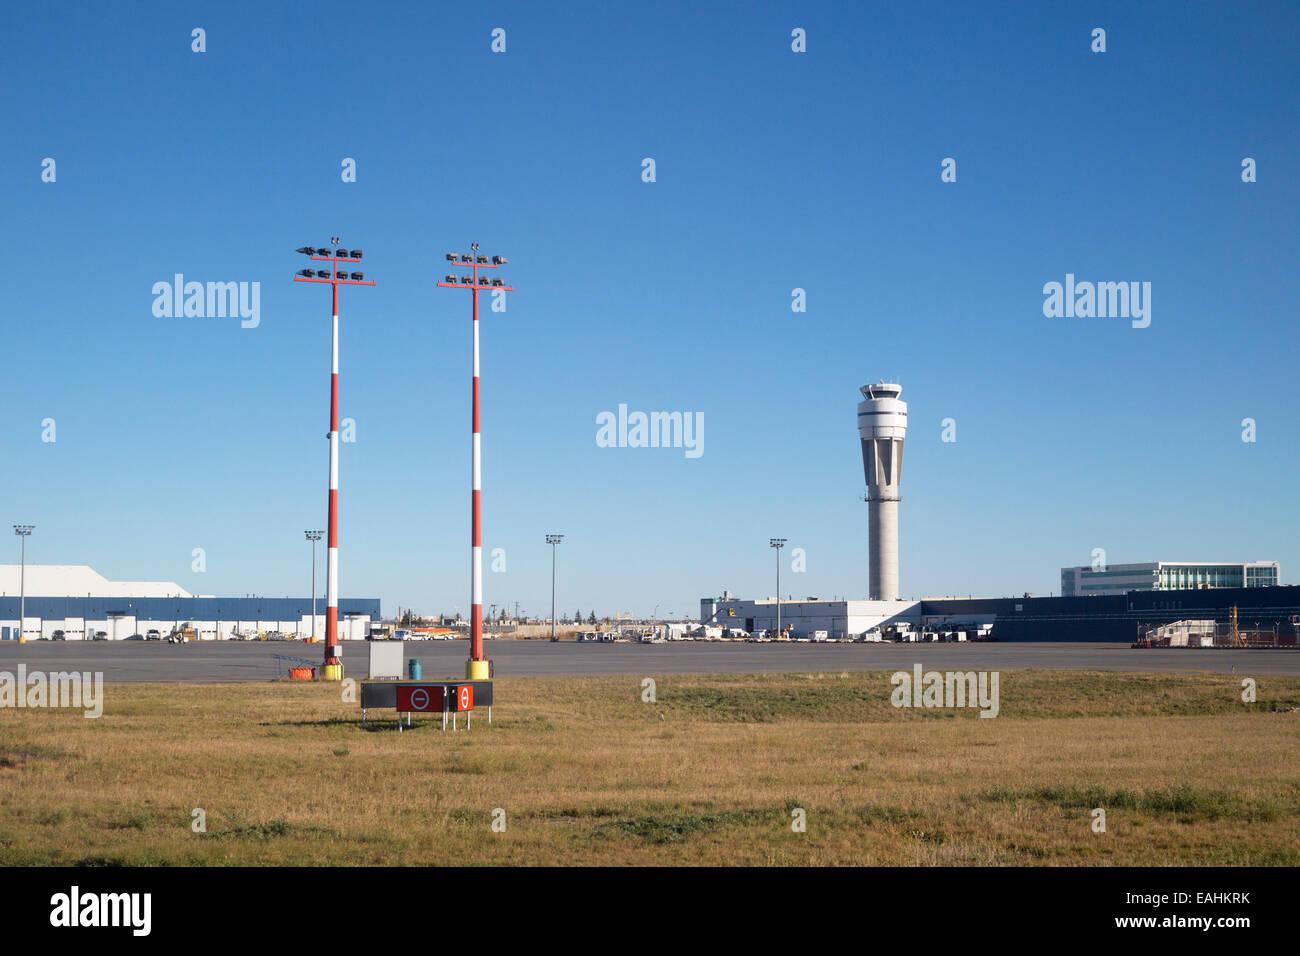 Calgary airport - Stock Image